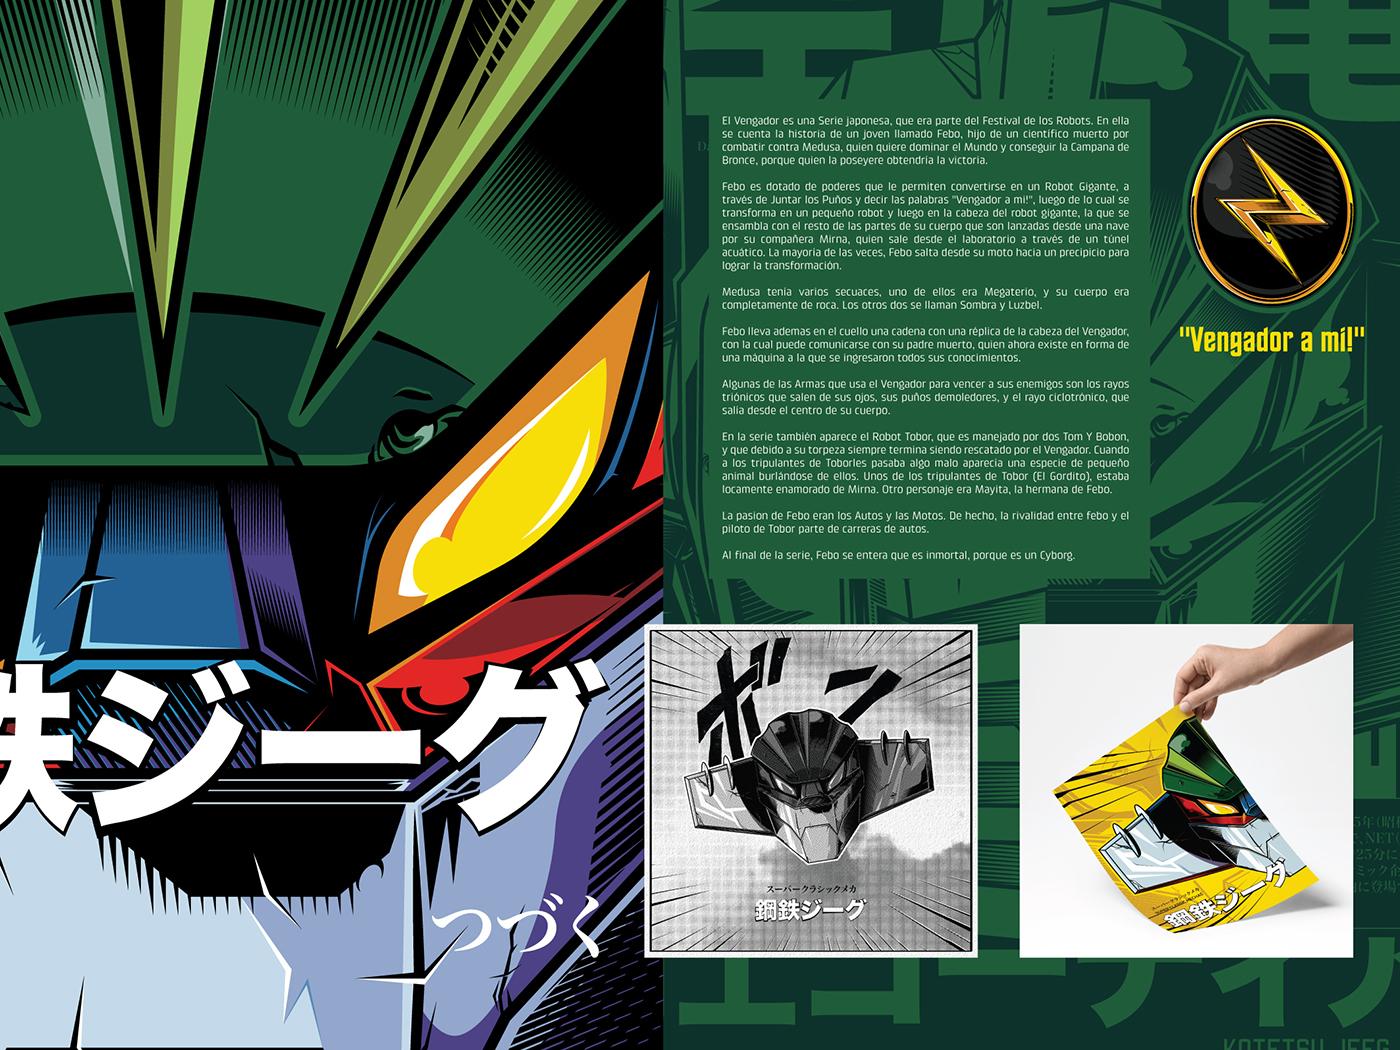 Super Classic Mechas Book gaiking gordian voltron mazinger steel jeeg retro show retro vectors anime digital art character design graphic design illustration vector